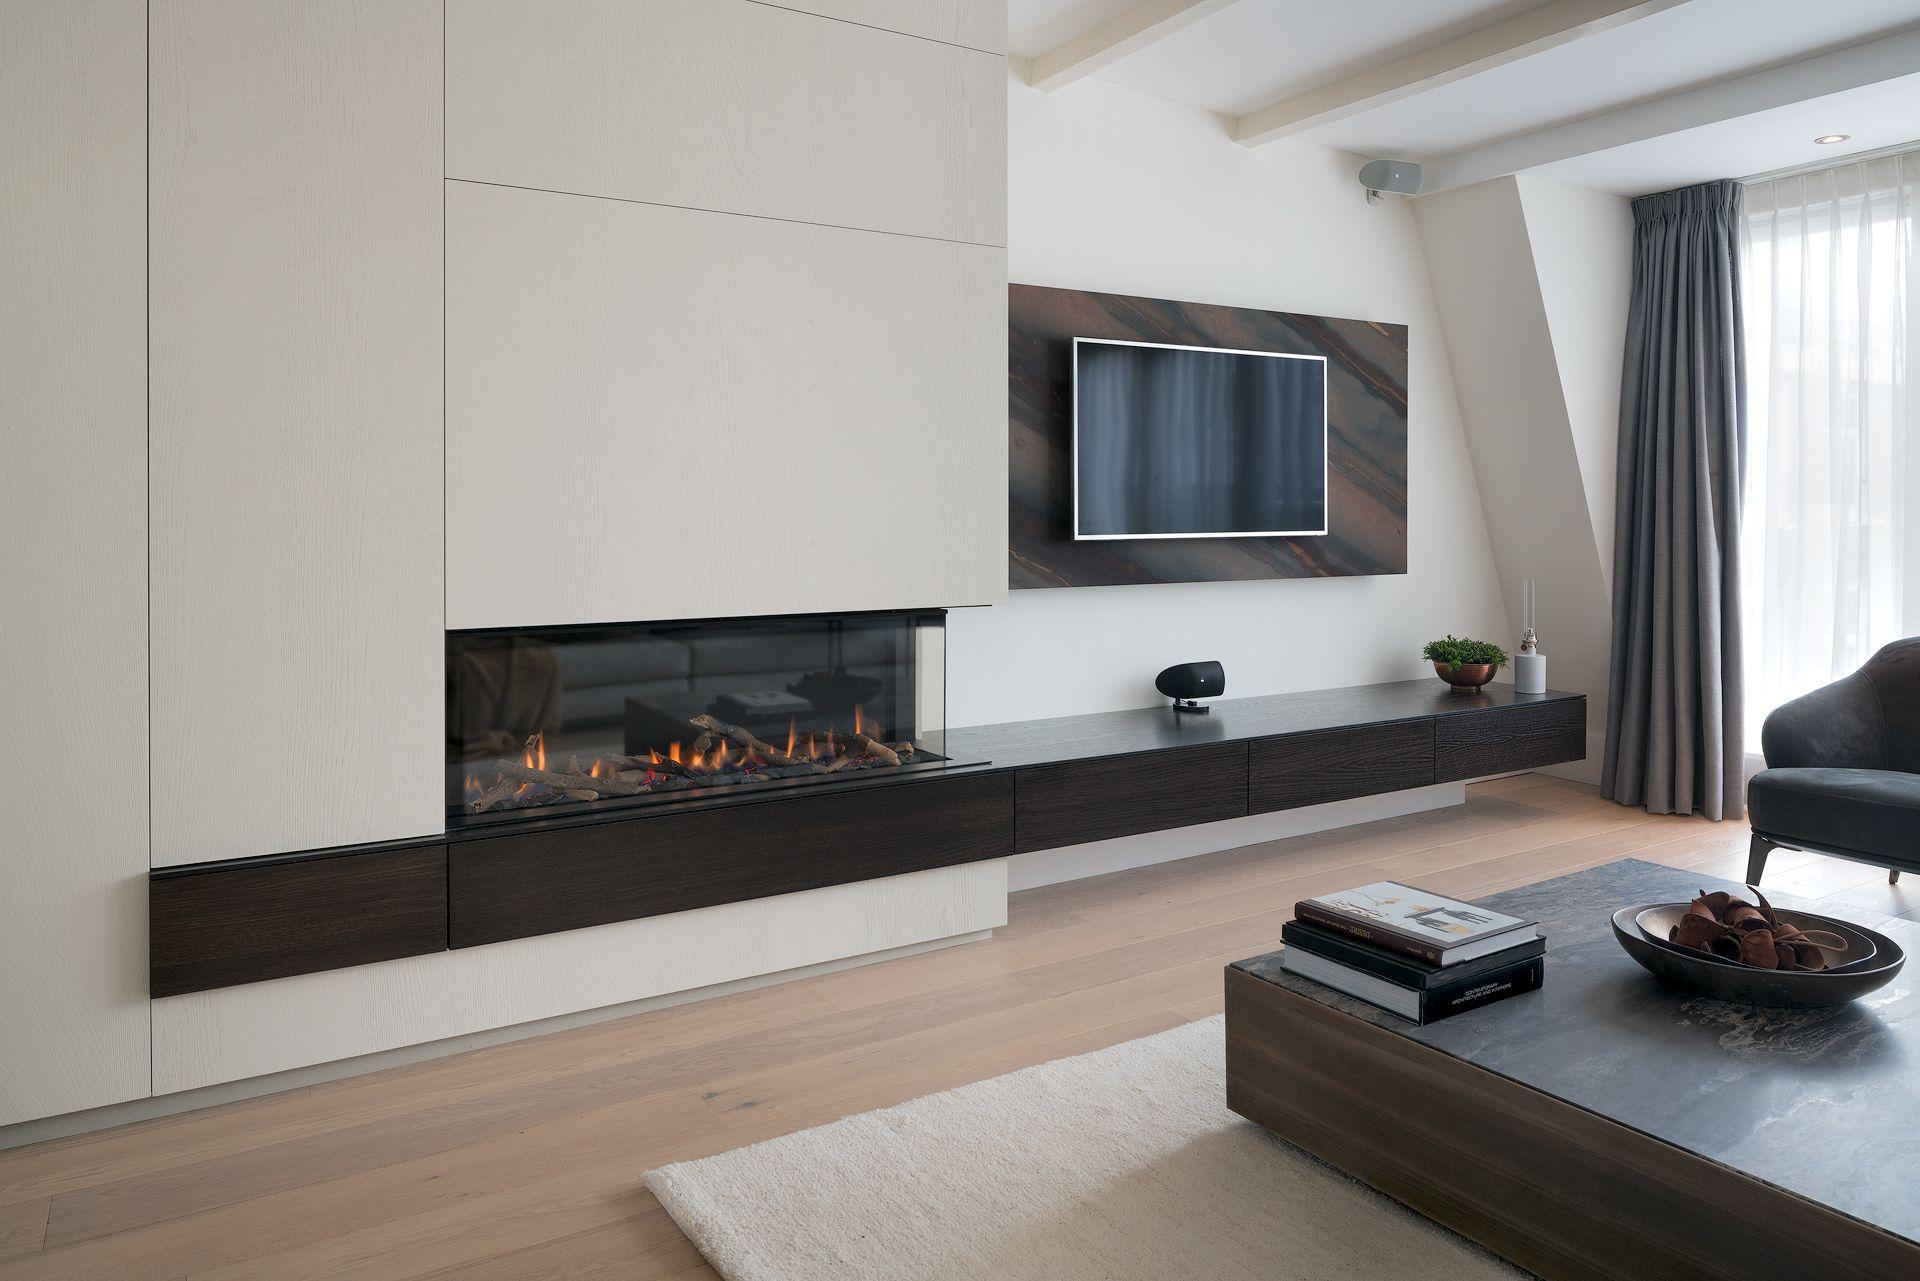 kolenik creates multifunctional luxury apartment in amsterdam a